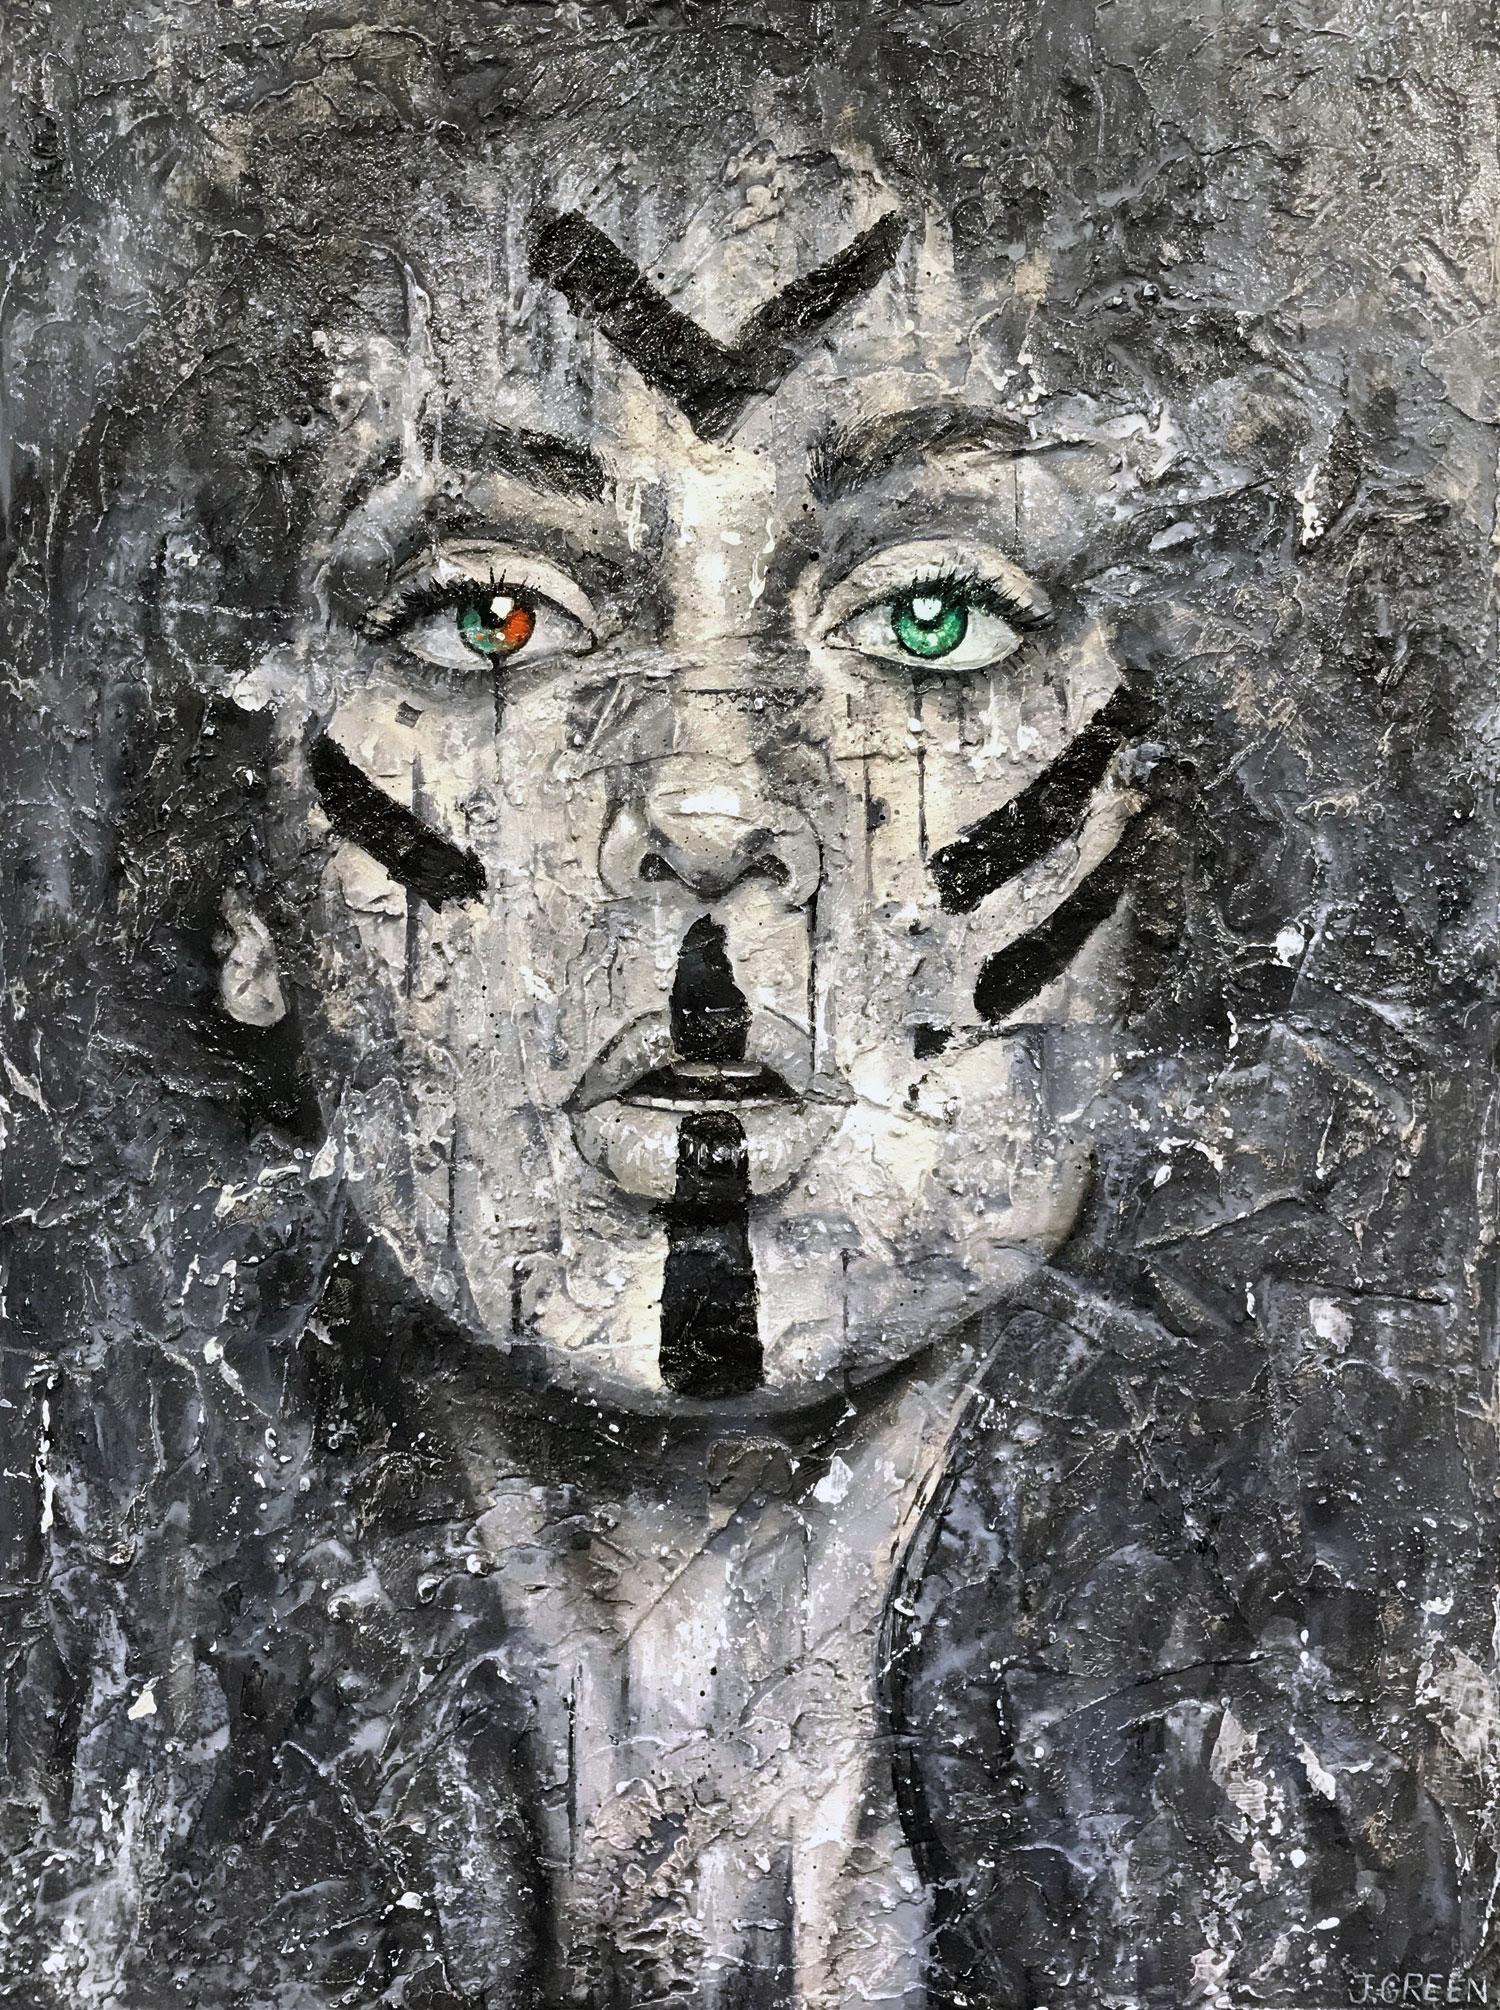 Jamie Green Artist - Apolonka